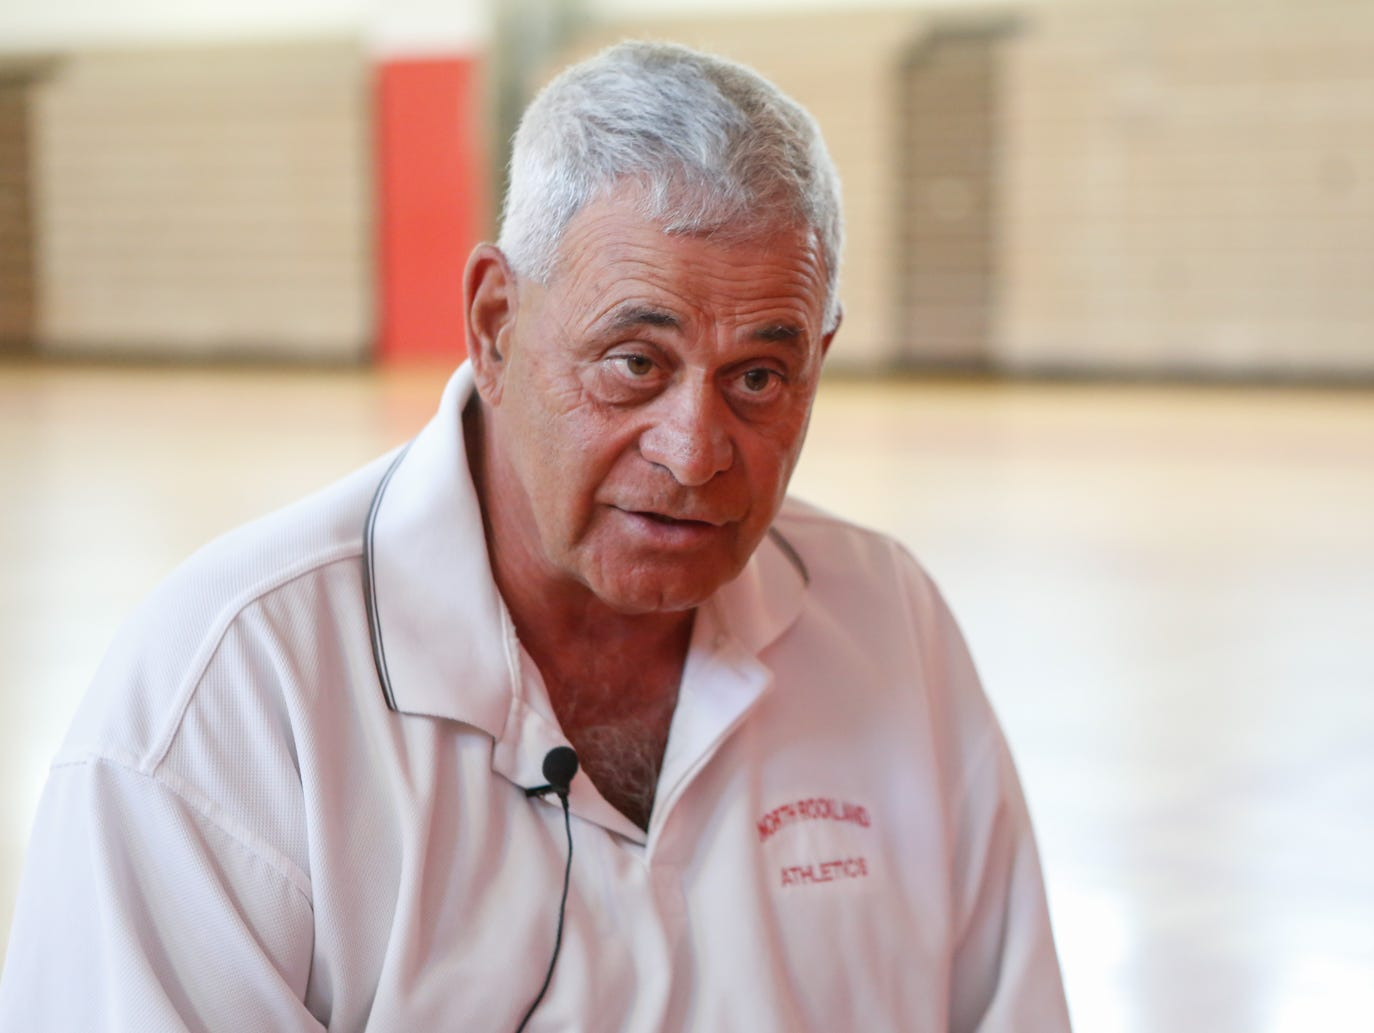 North Rockland athletic director Joe Casarella photographed in the gymnasium of North Rockland High School on July 19, 2016.